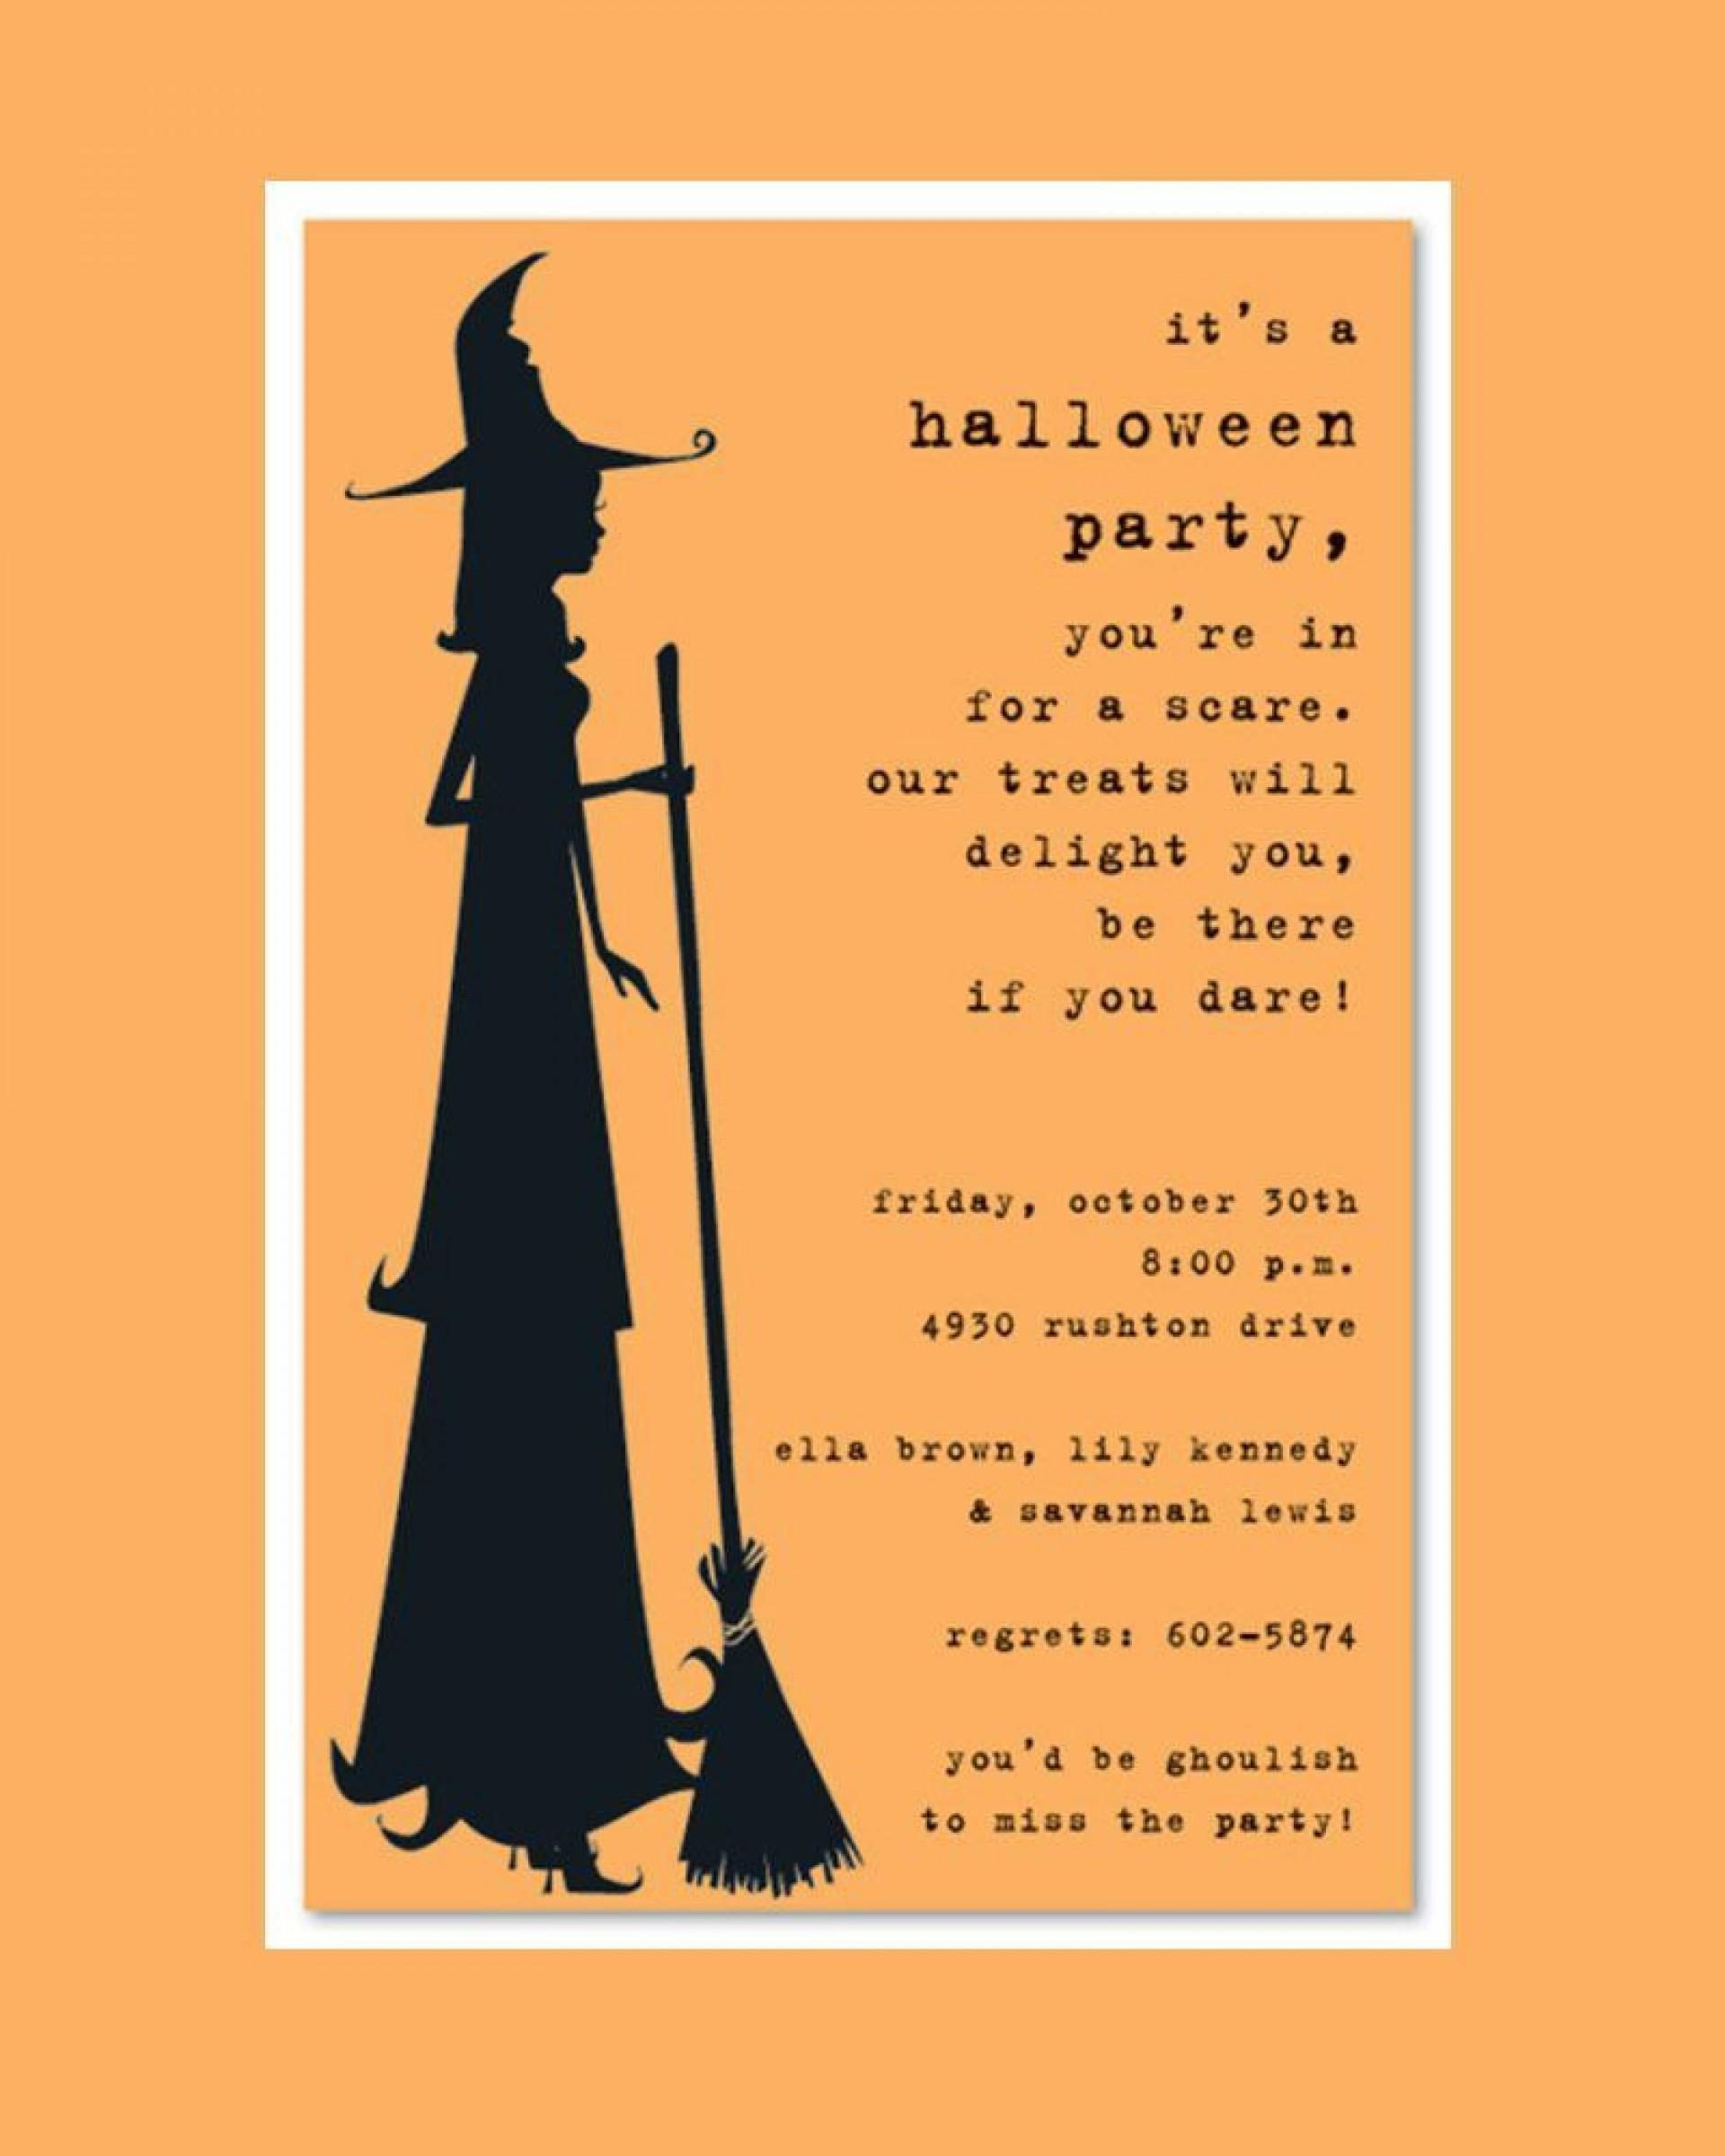 006 Wondrou Halloween Party Invite Template Photo  Templates - Free Printable Spooky Invitation Birthday1920